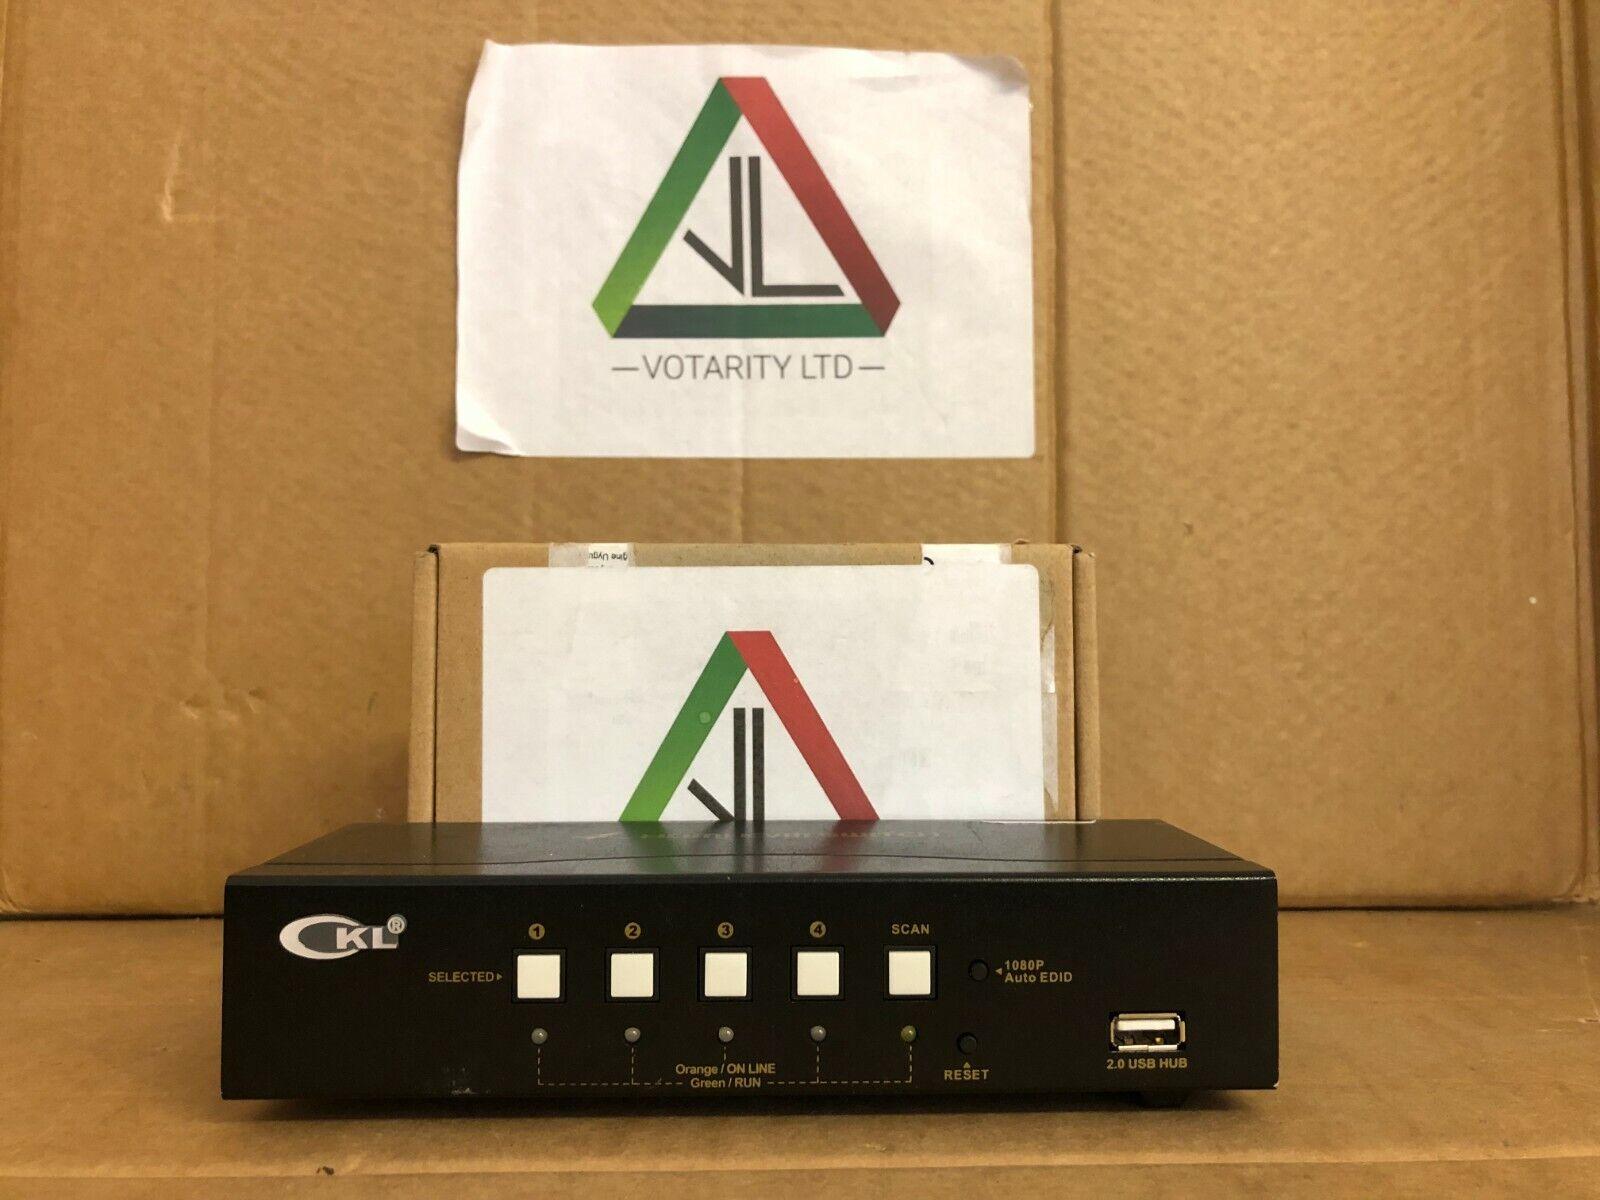 CKL 4-Port HDMI KVM Switch + USB CKL Model: CKL-94HUA HDMI KVM Switch (Inc VAT)